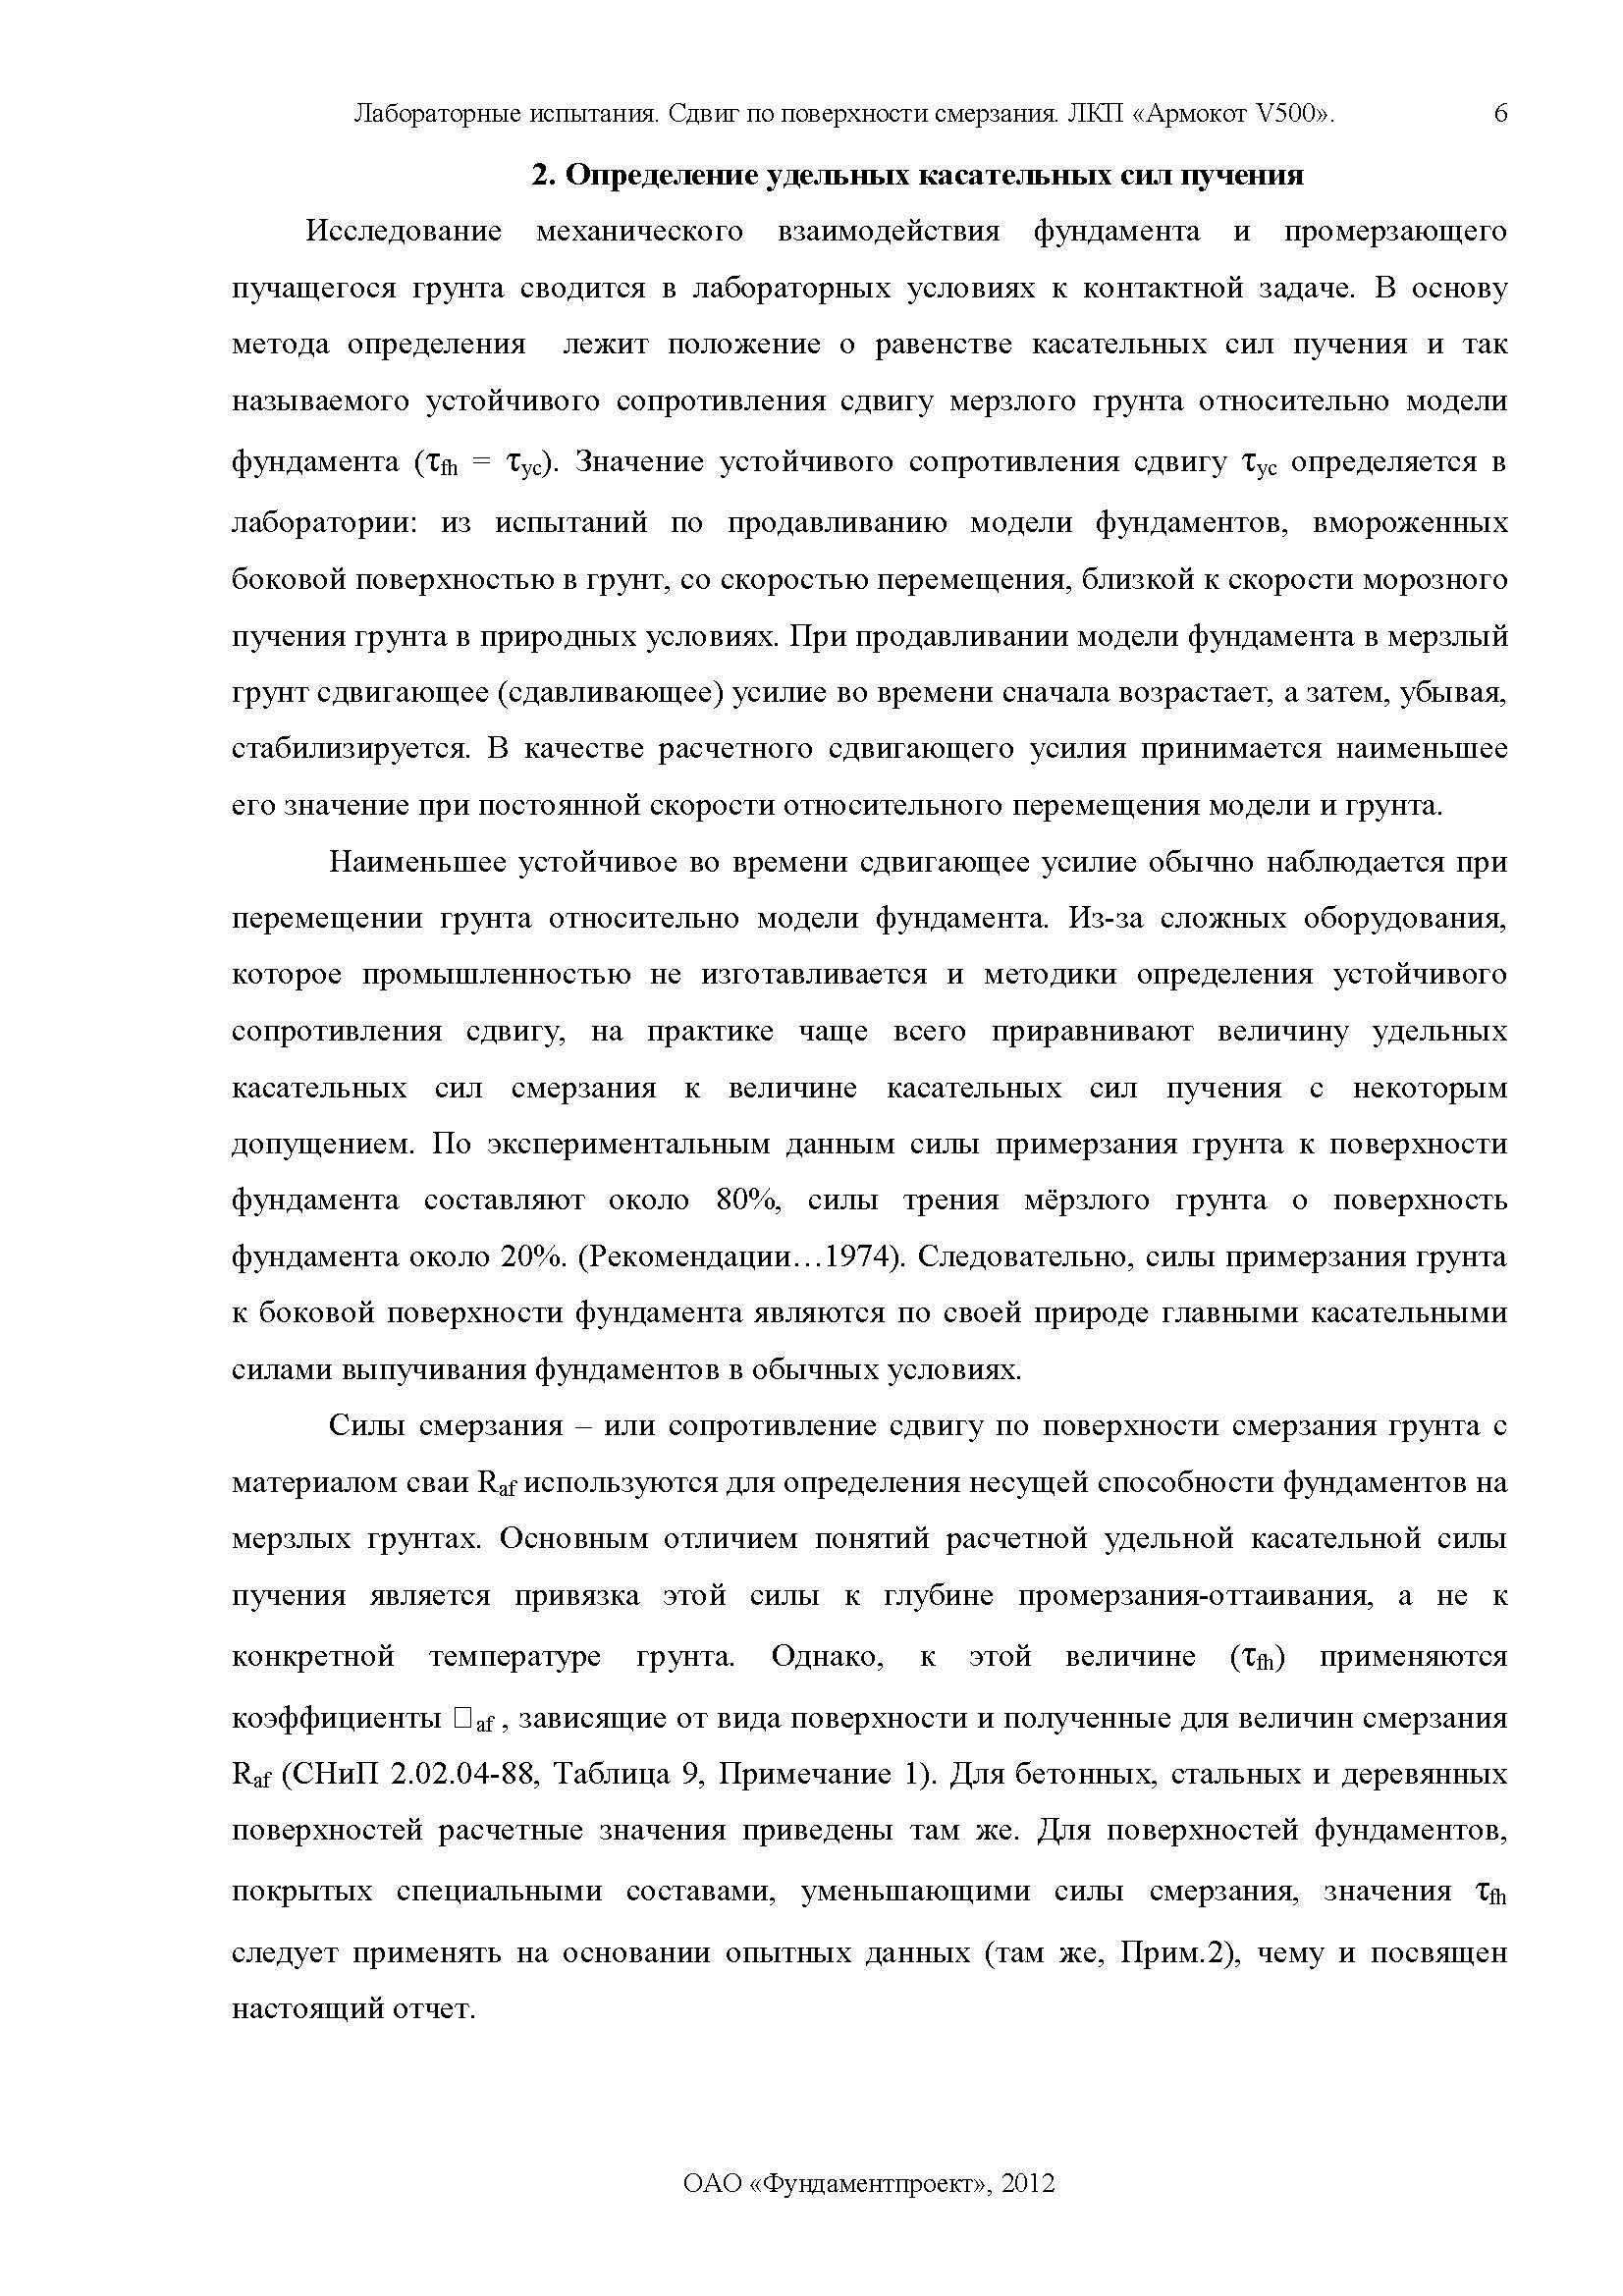 Отчет по сваям Армокот V500 Фундаментпроект_Страница_06